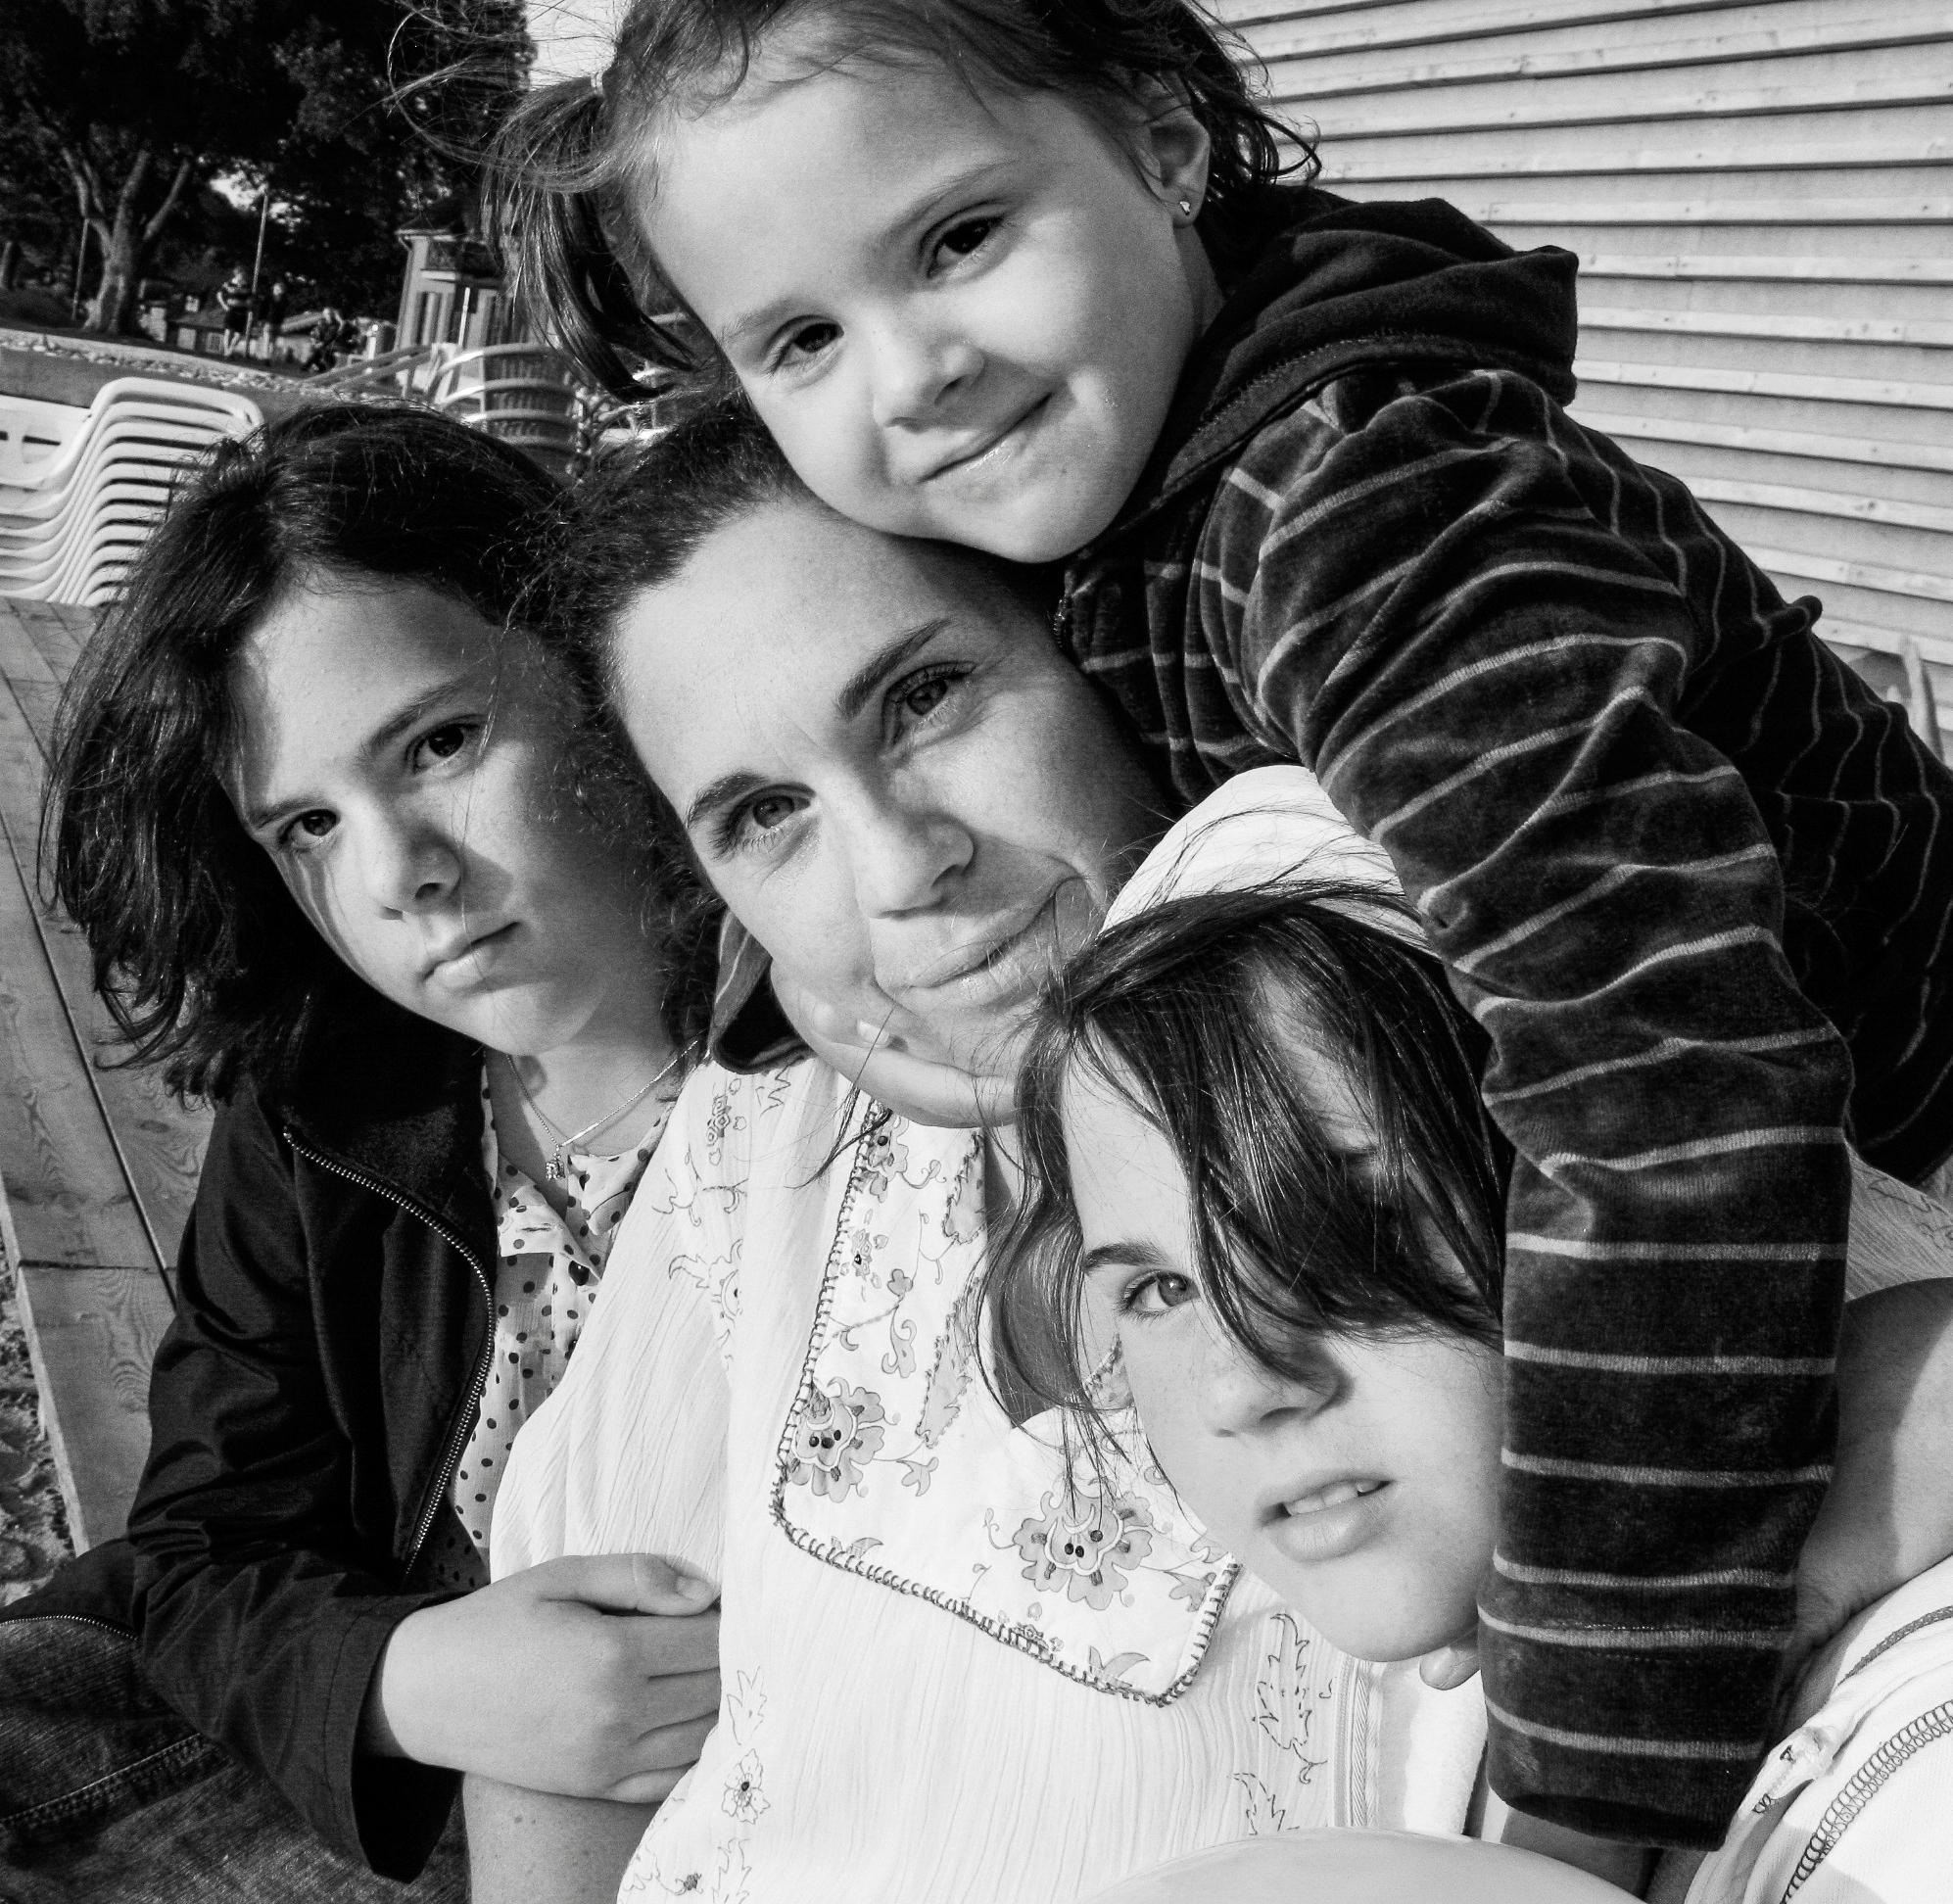 Nu fruktar familjen for dotterns liv